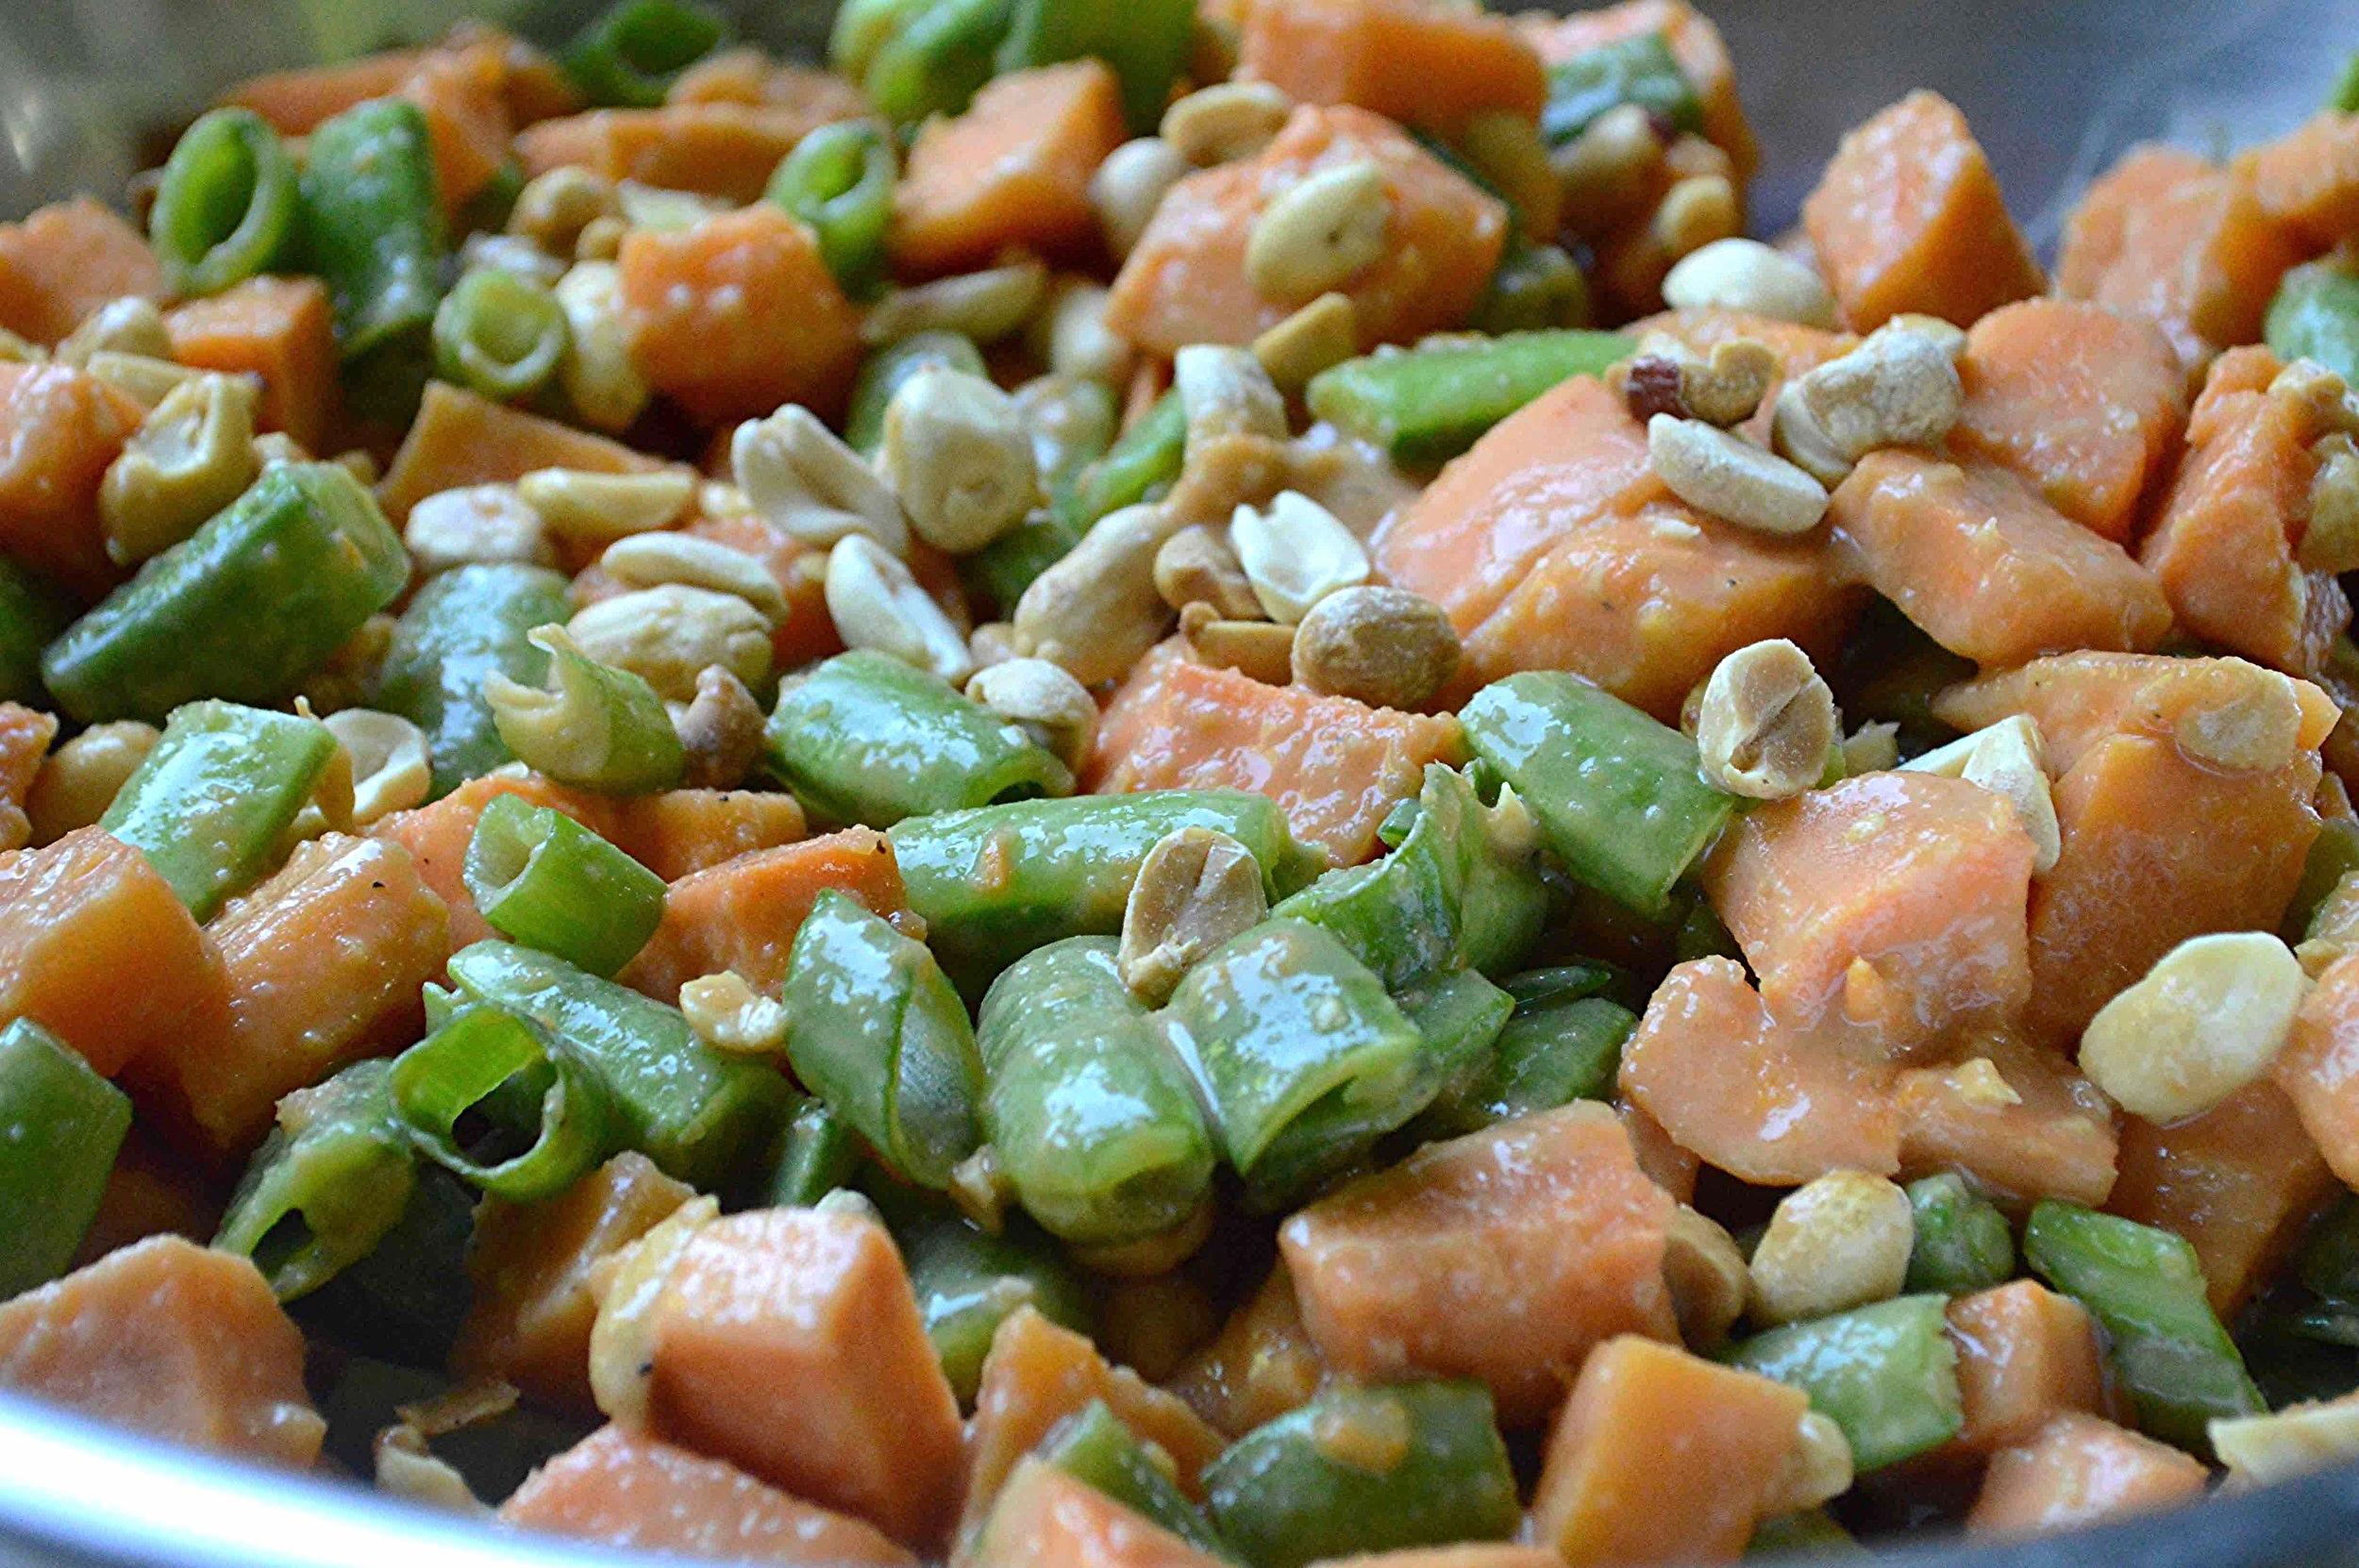 Spicy Peanutty Sweet Potato Salad